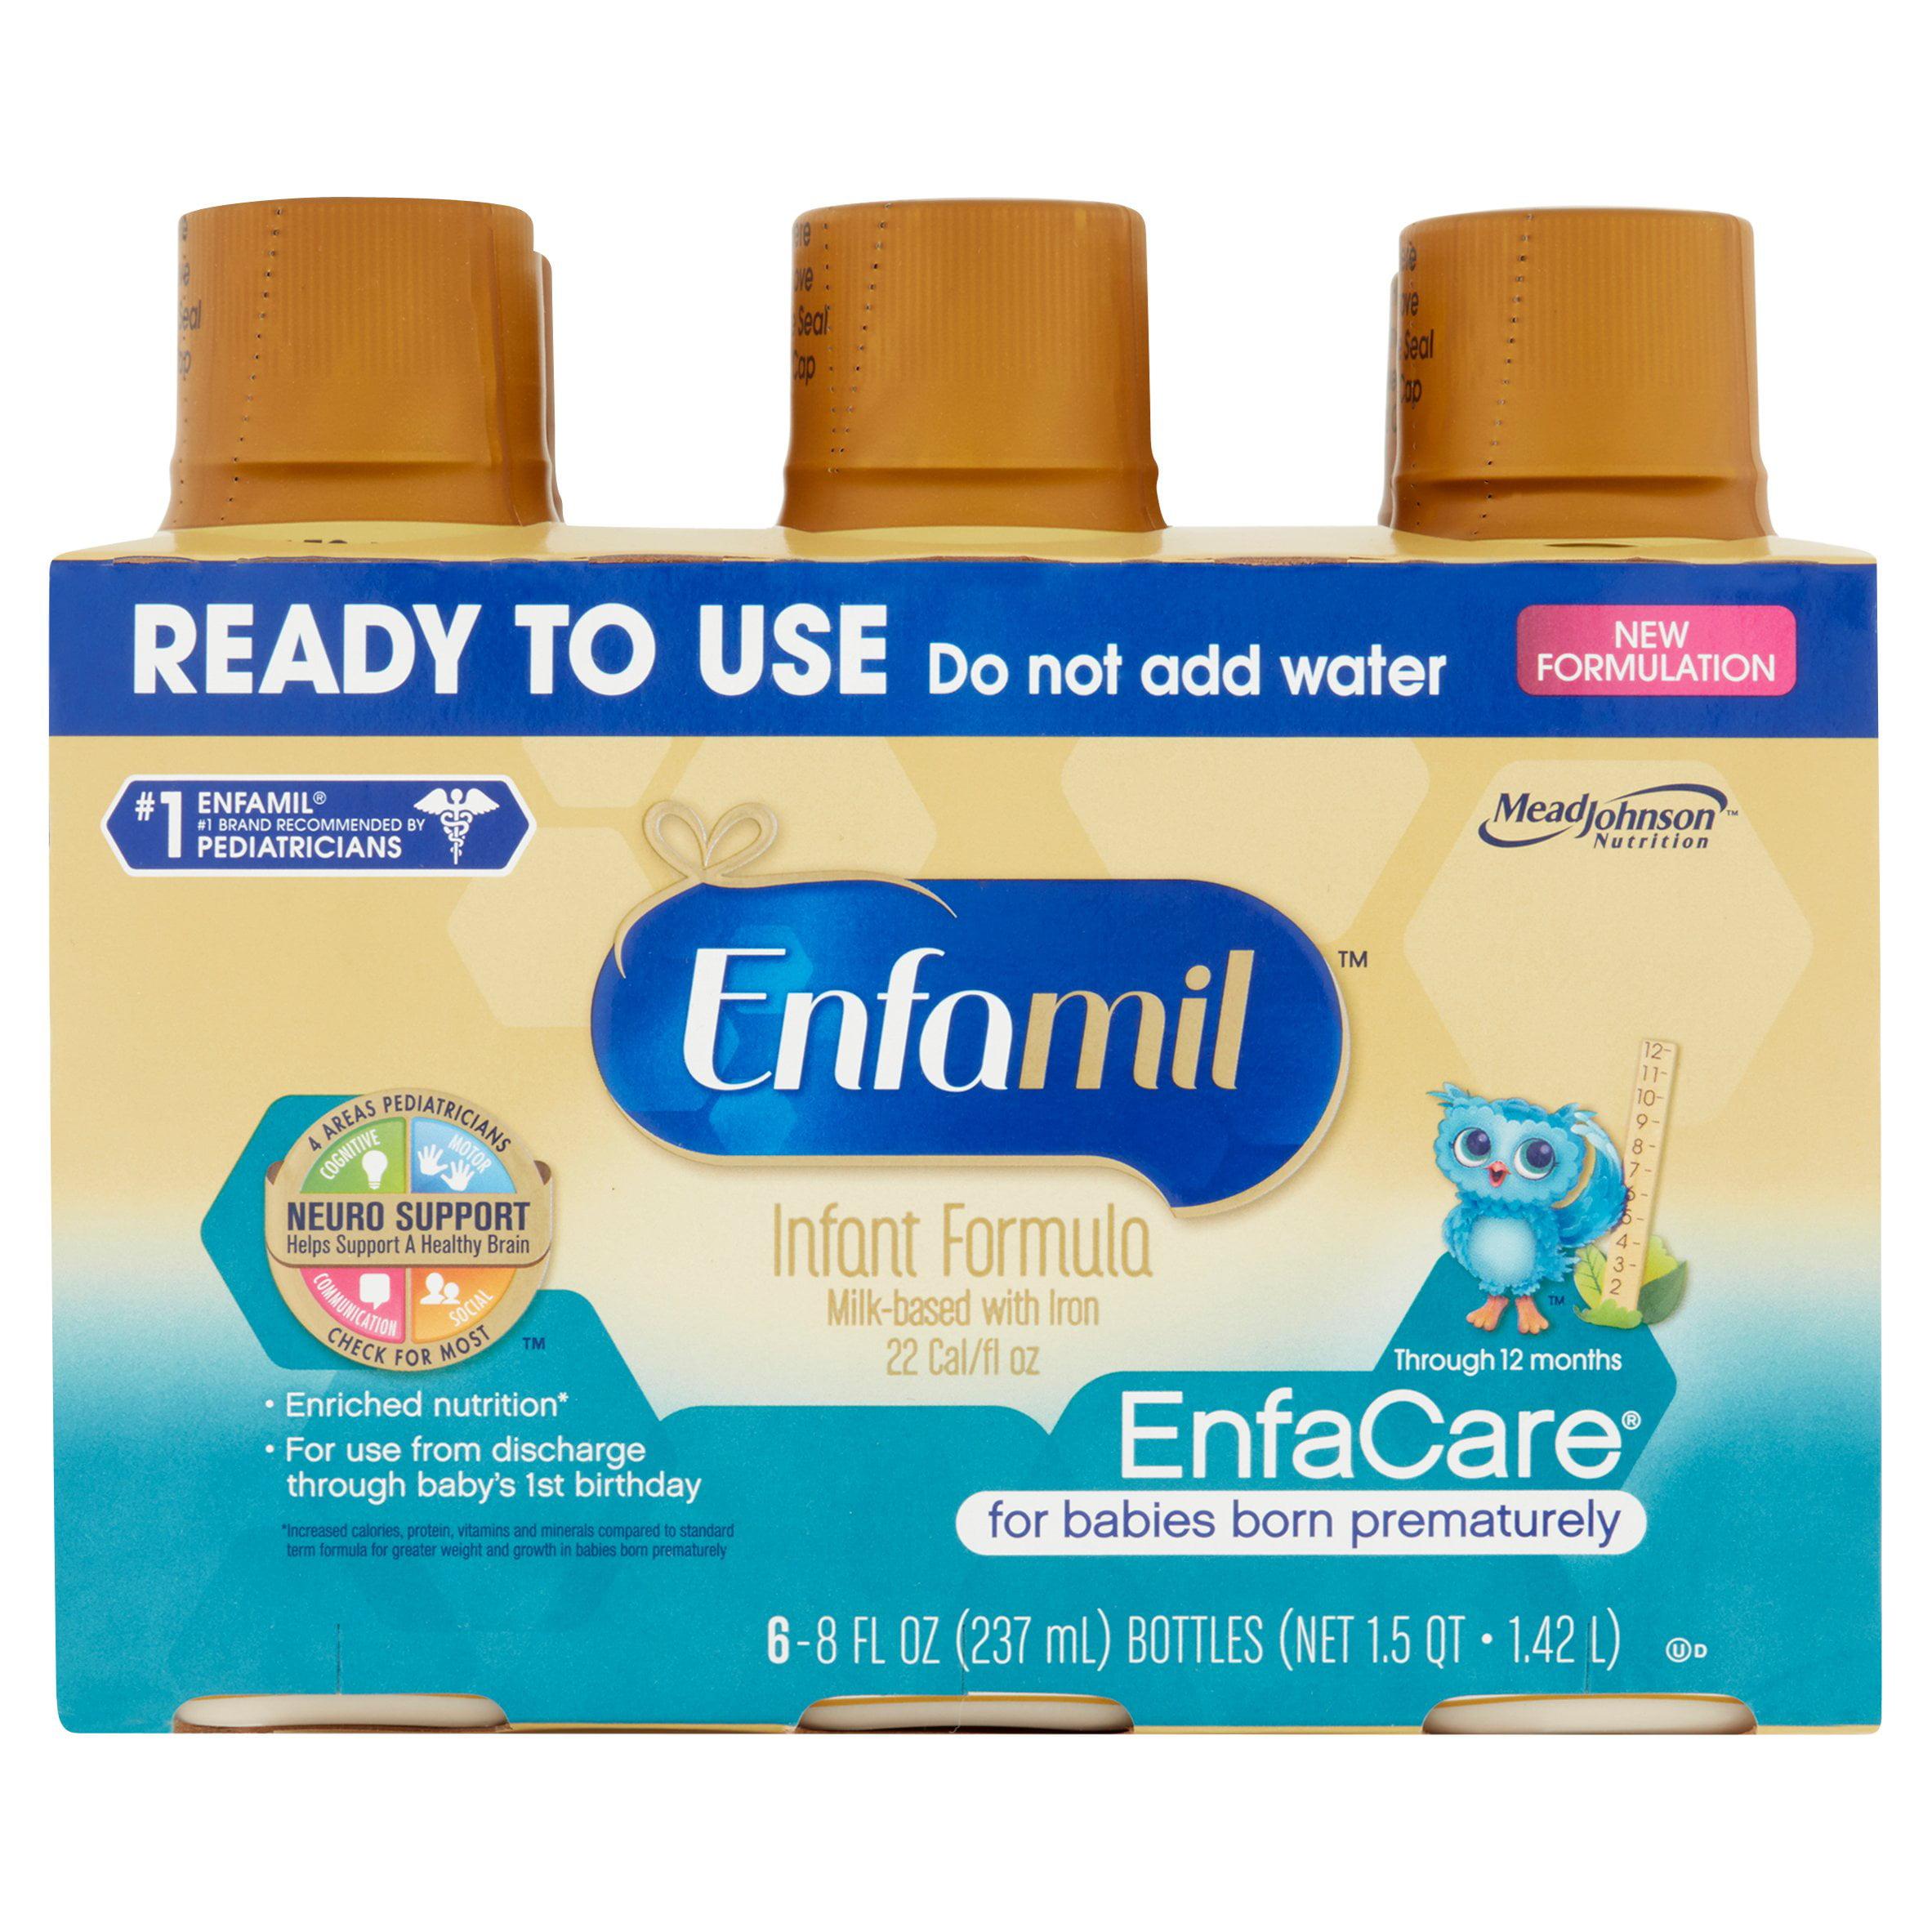 Enfamil EnfaCare Baby Formula Ready-to-Use (24 Pack) 8 fl. oz bottles